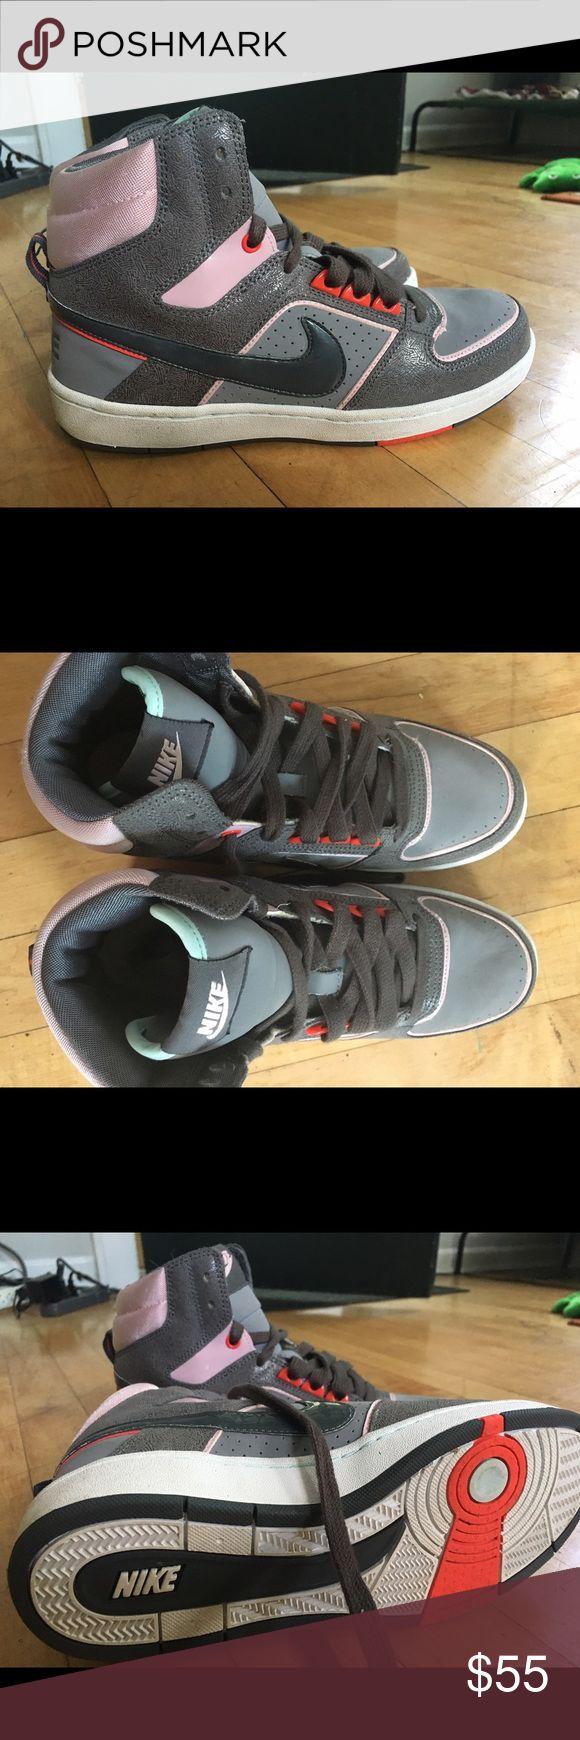 Nike hi tops, worn once indoors Nike hi tops, worn once indoors Nike Shoes Athletic Shoes